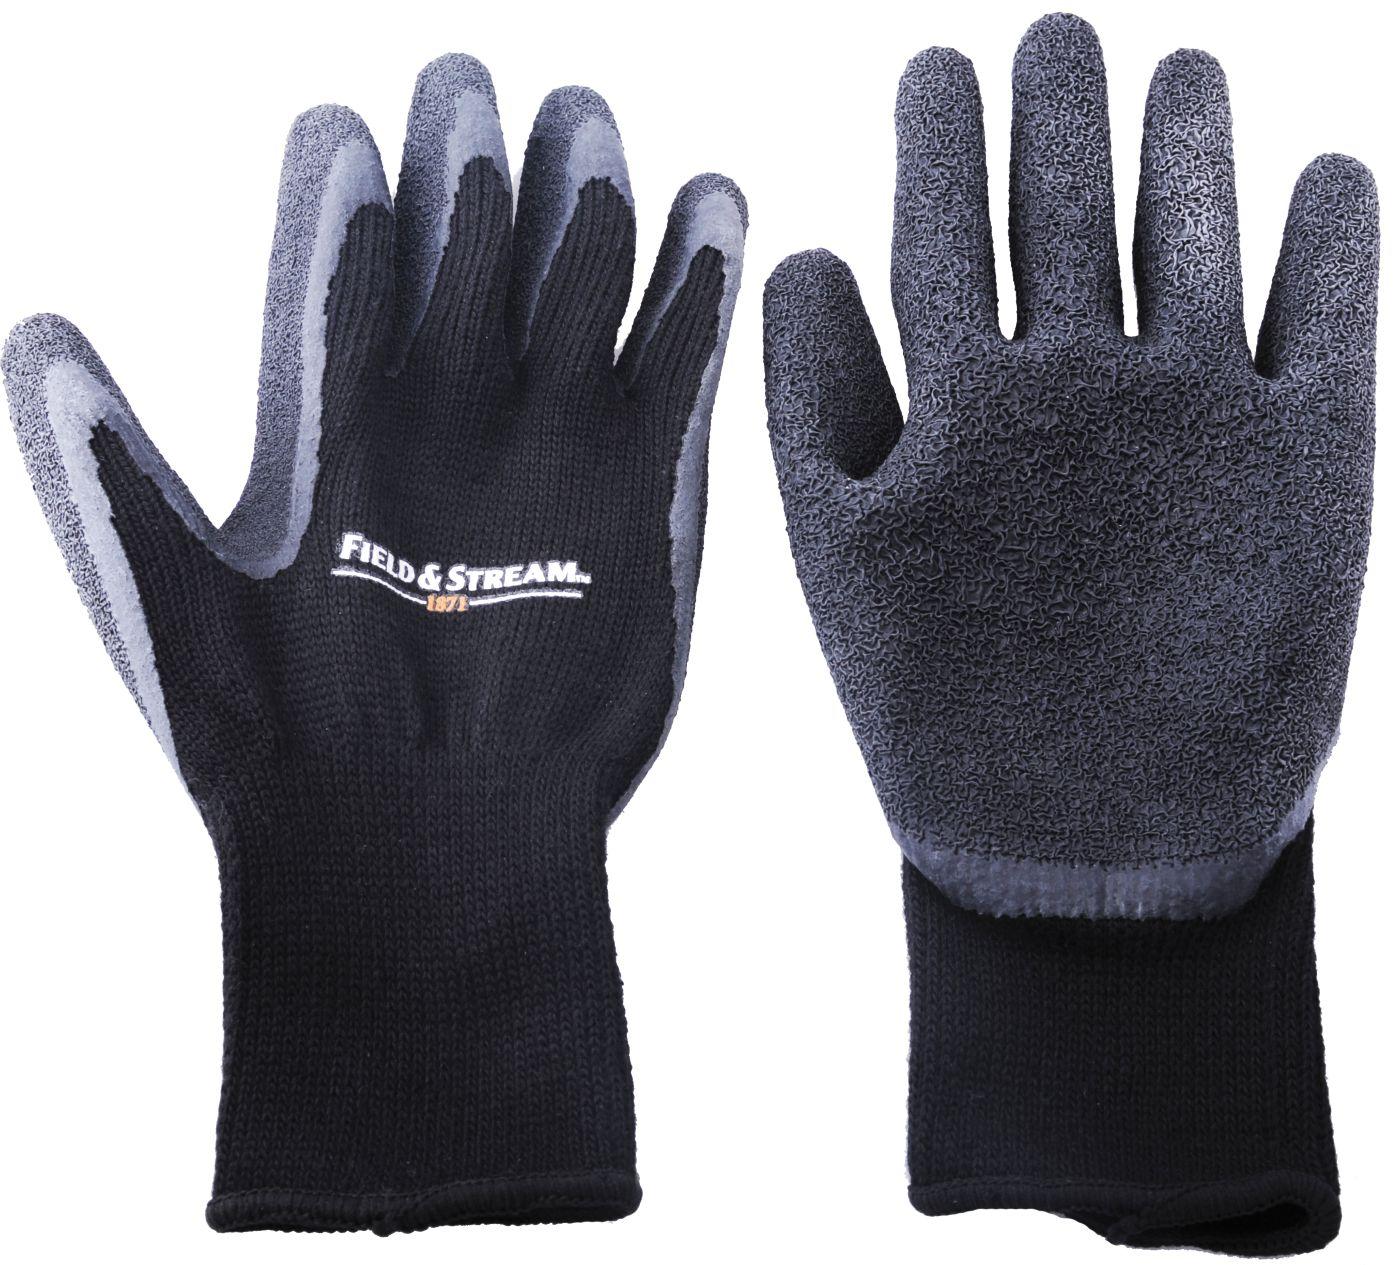 Field & Stream Protective Fisherman's Gloves